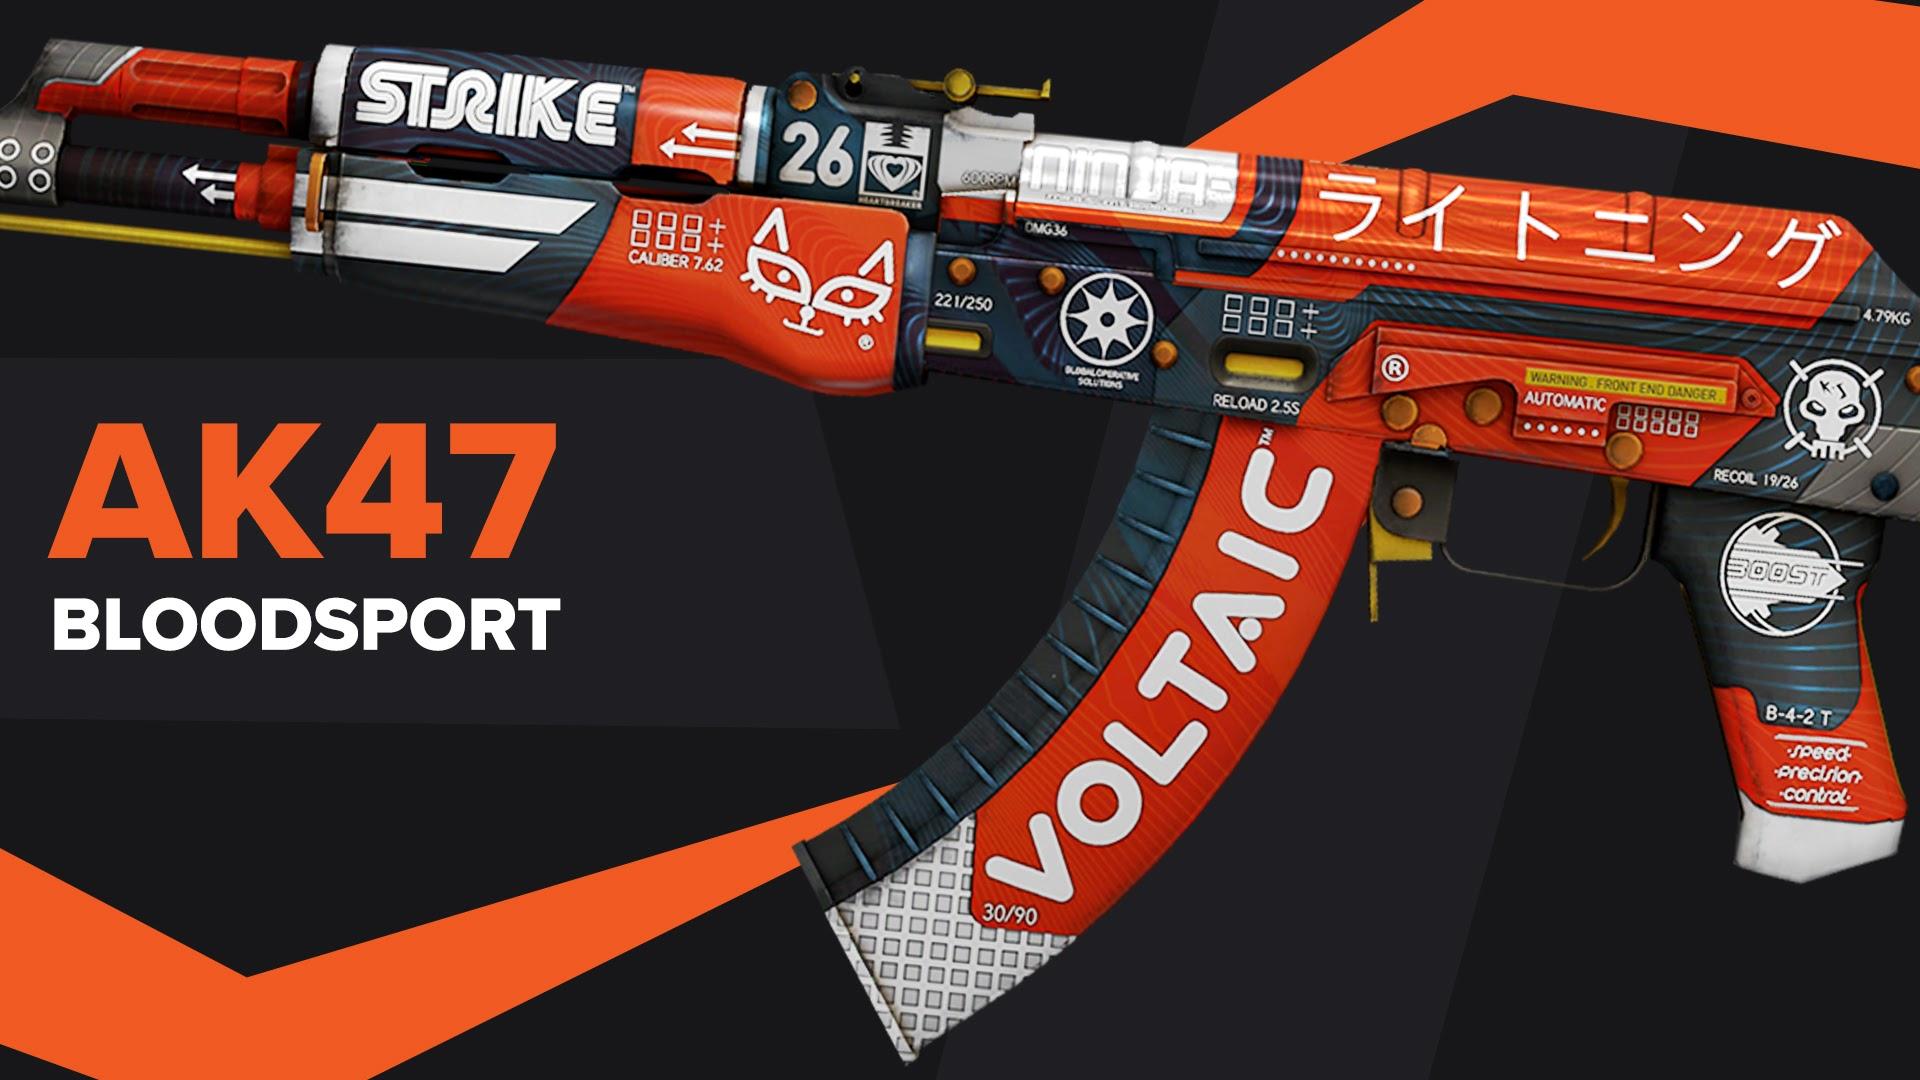 AK47 Bloodsport CSGO Skin